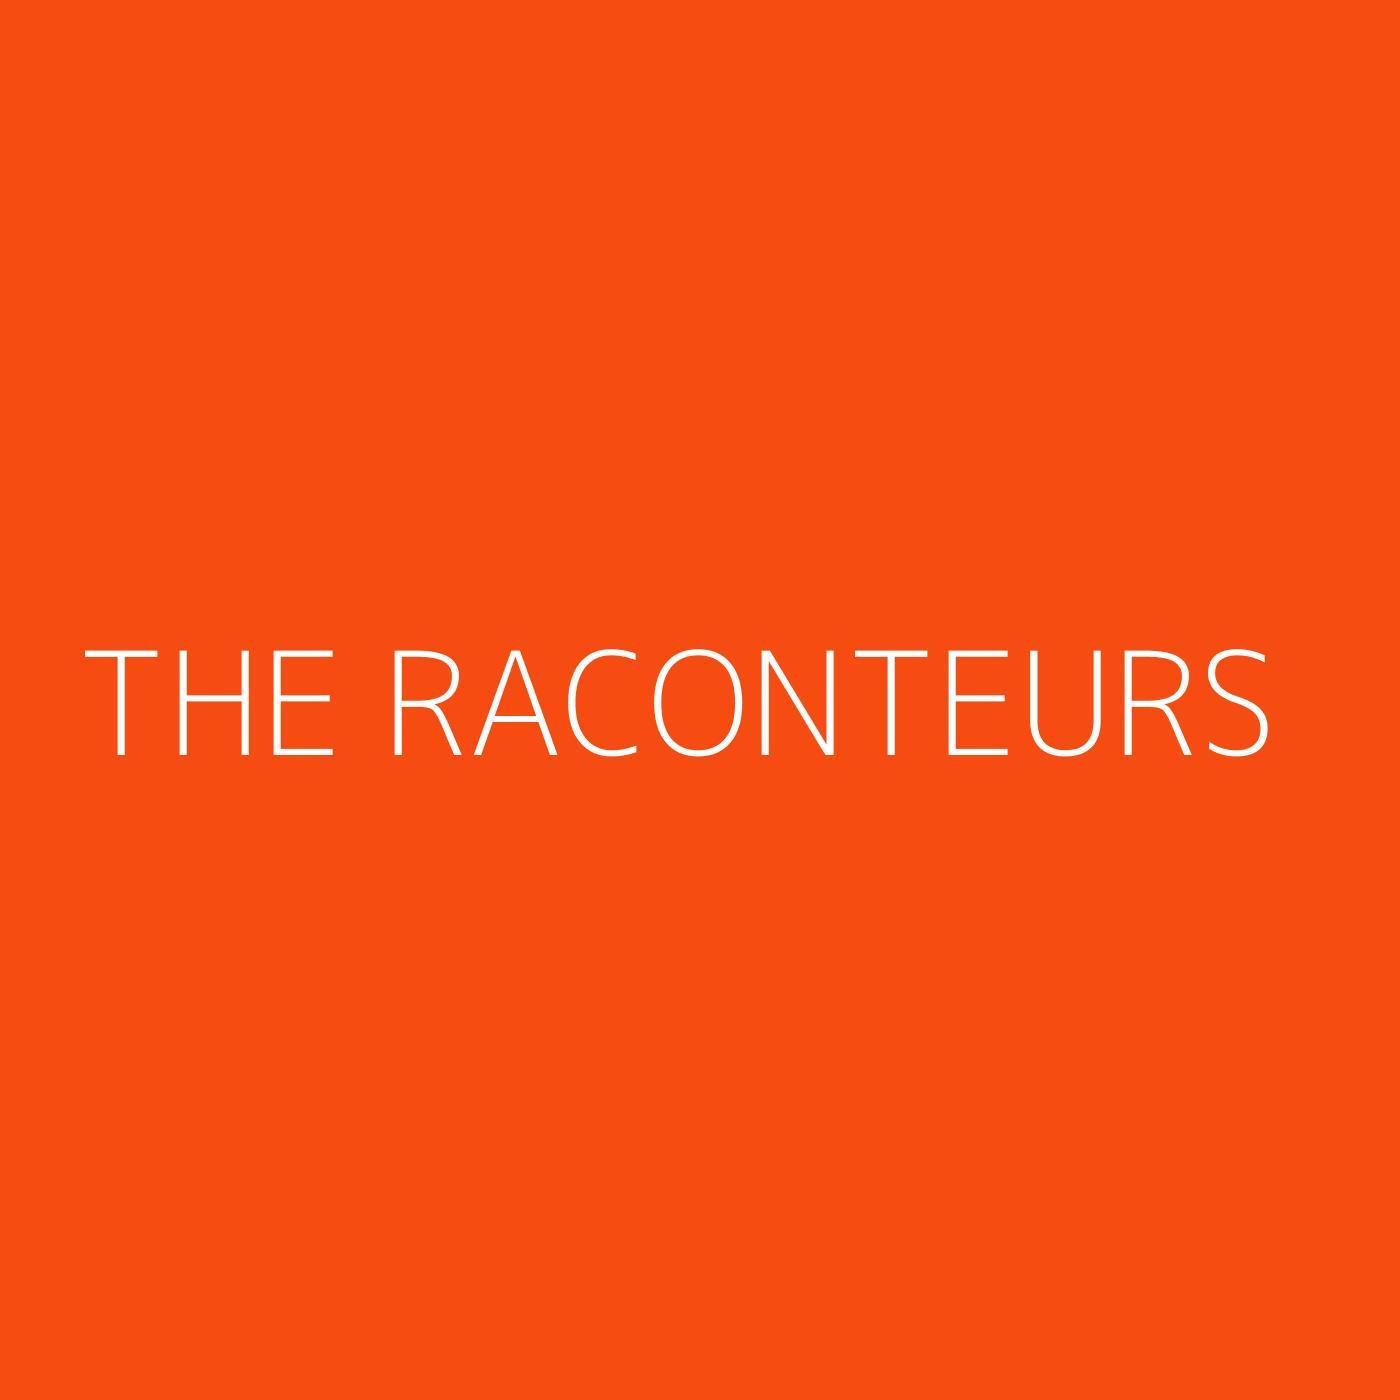 The Raconteurs Playlist Artwork